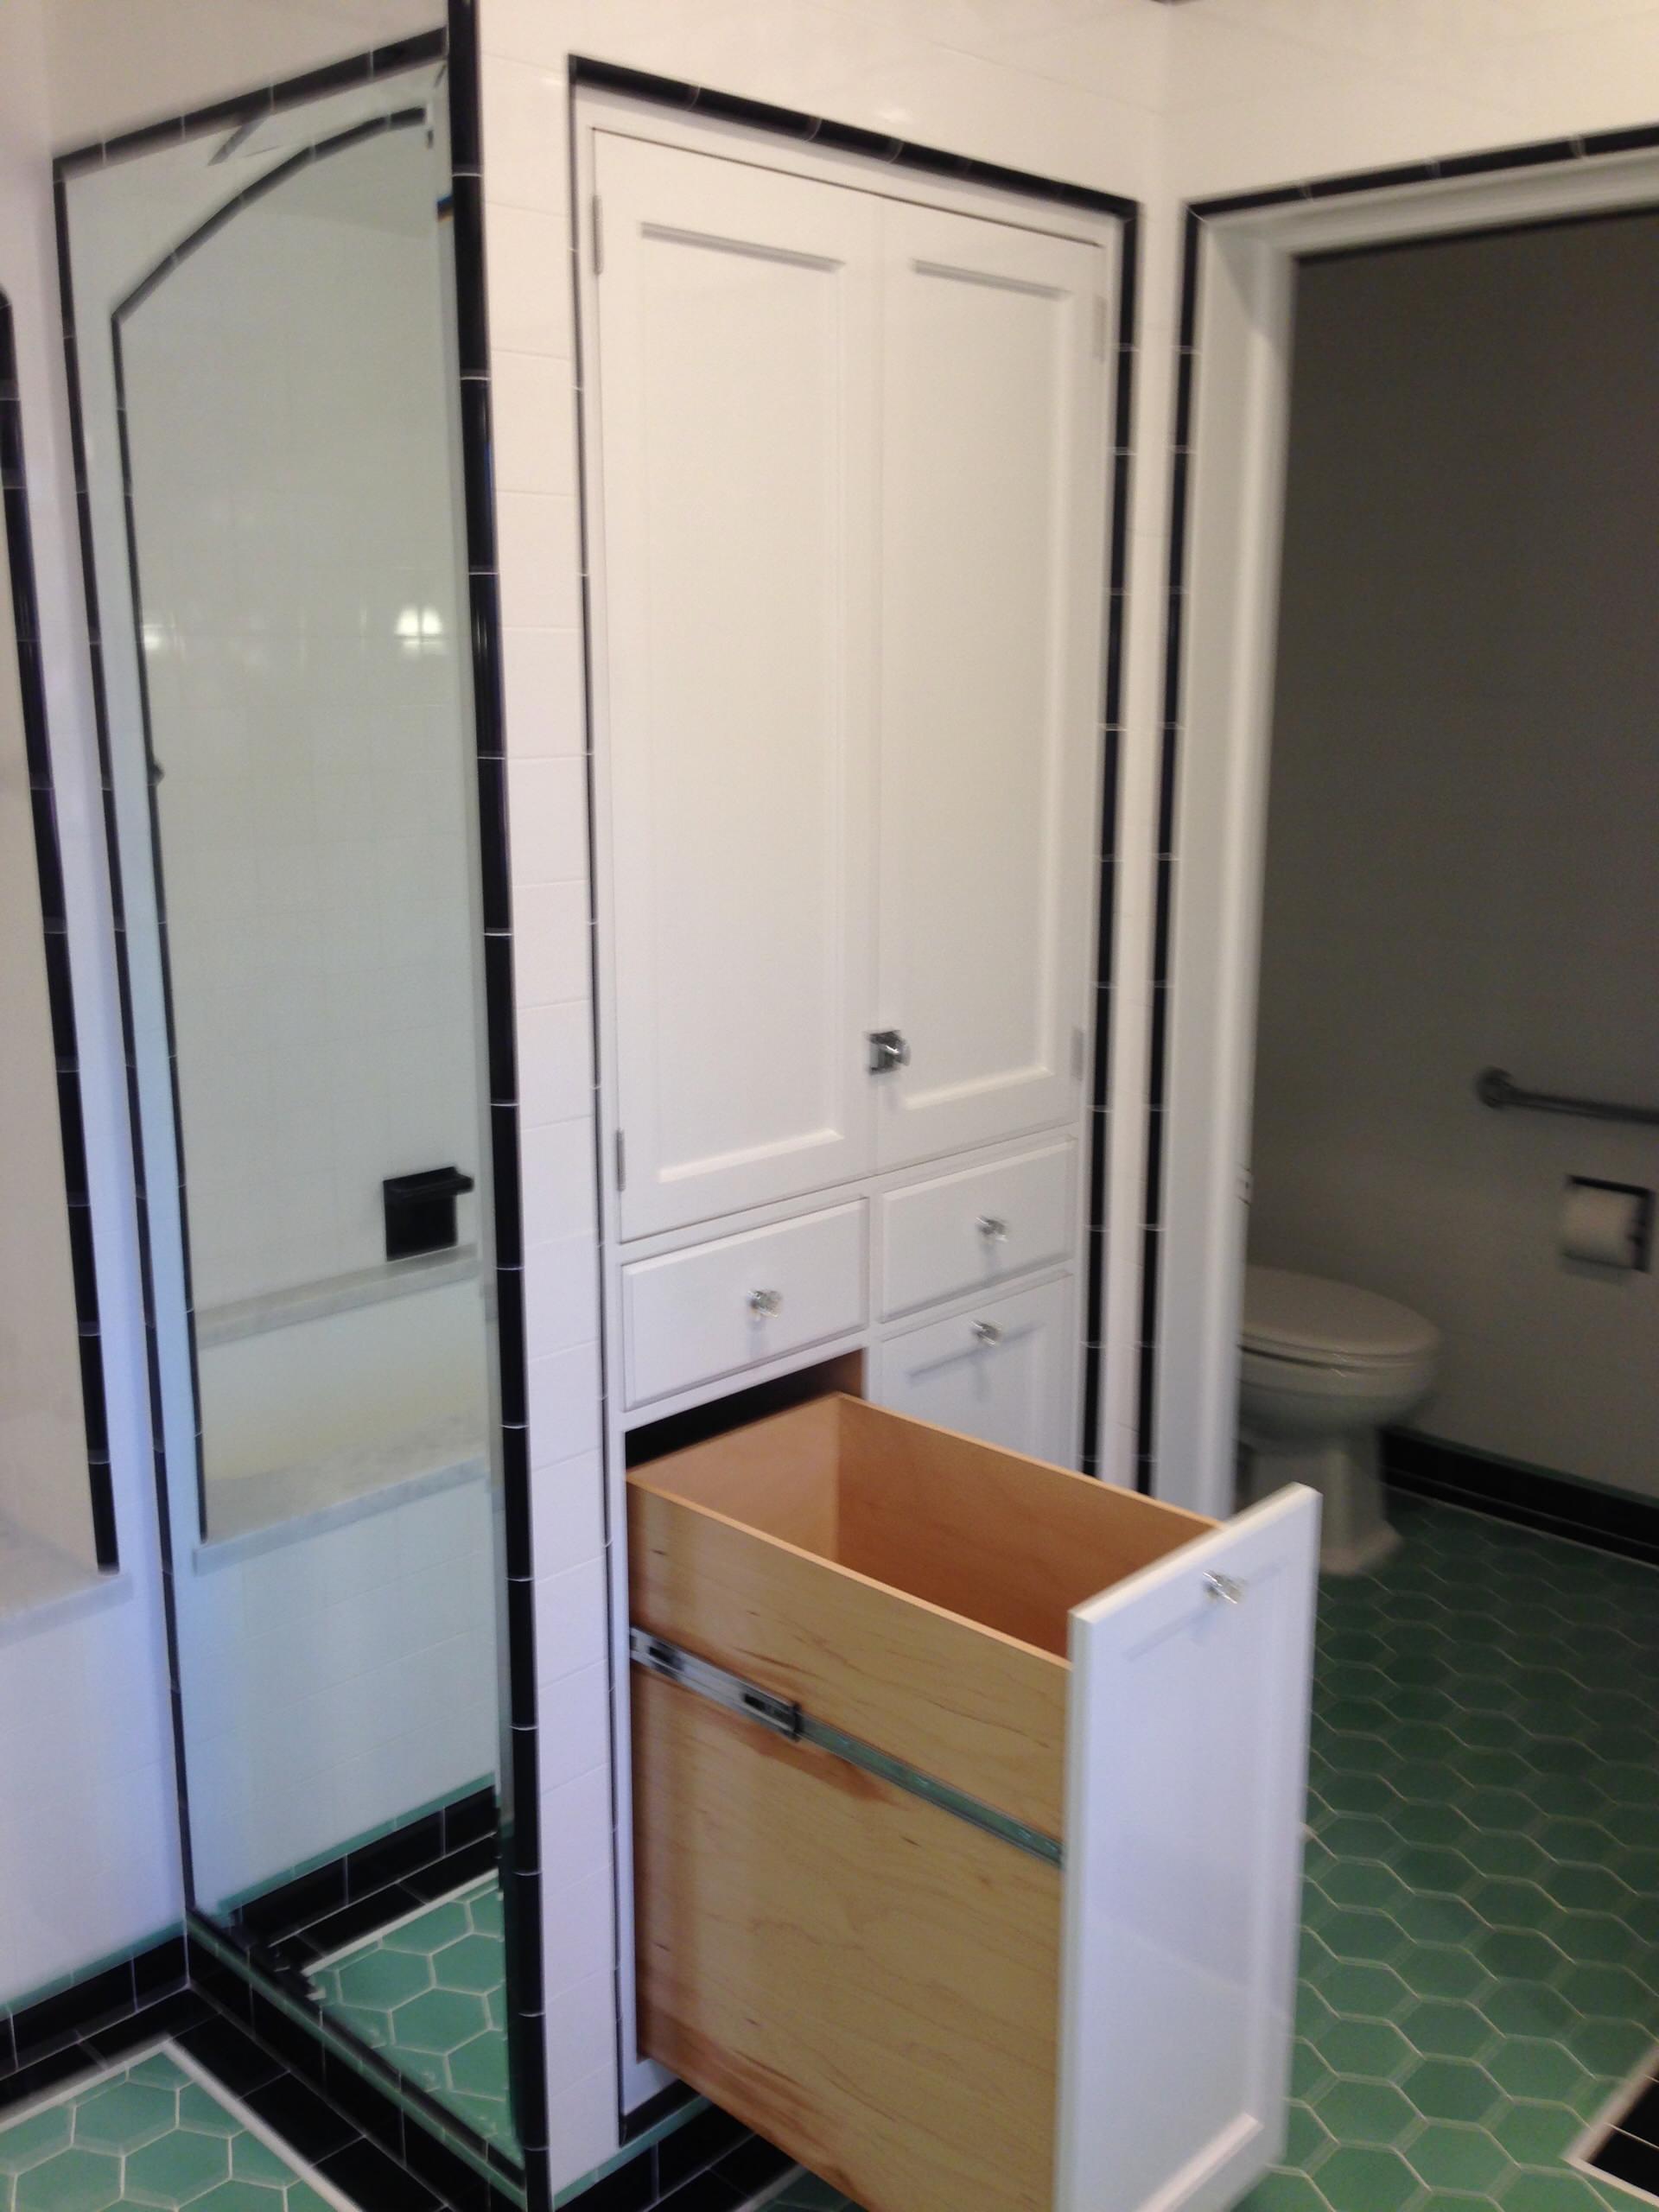 Beverly Hills Historic Home Renovation - Master Bathroom